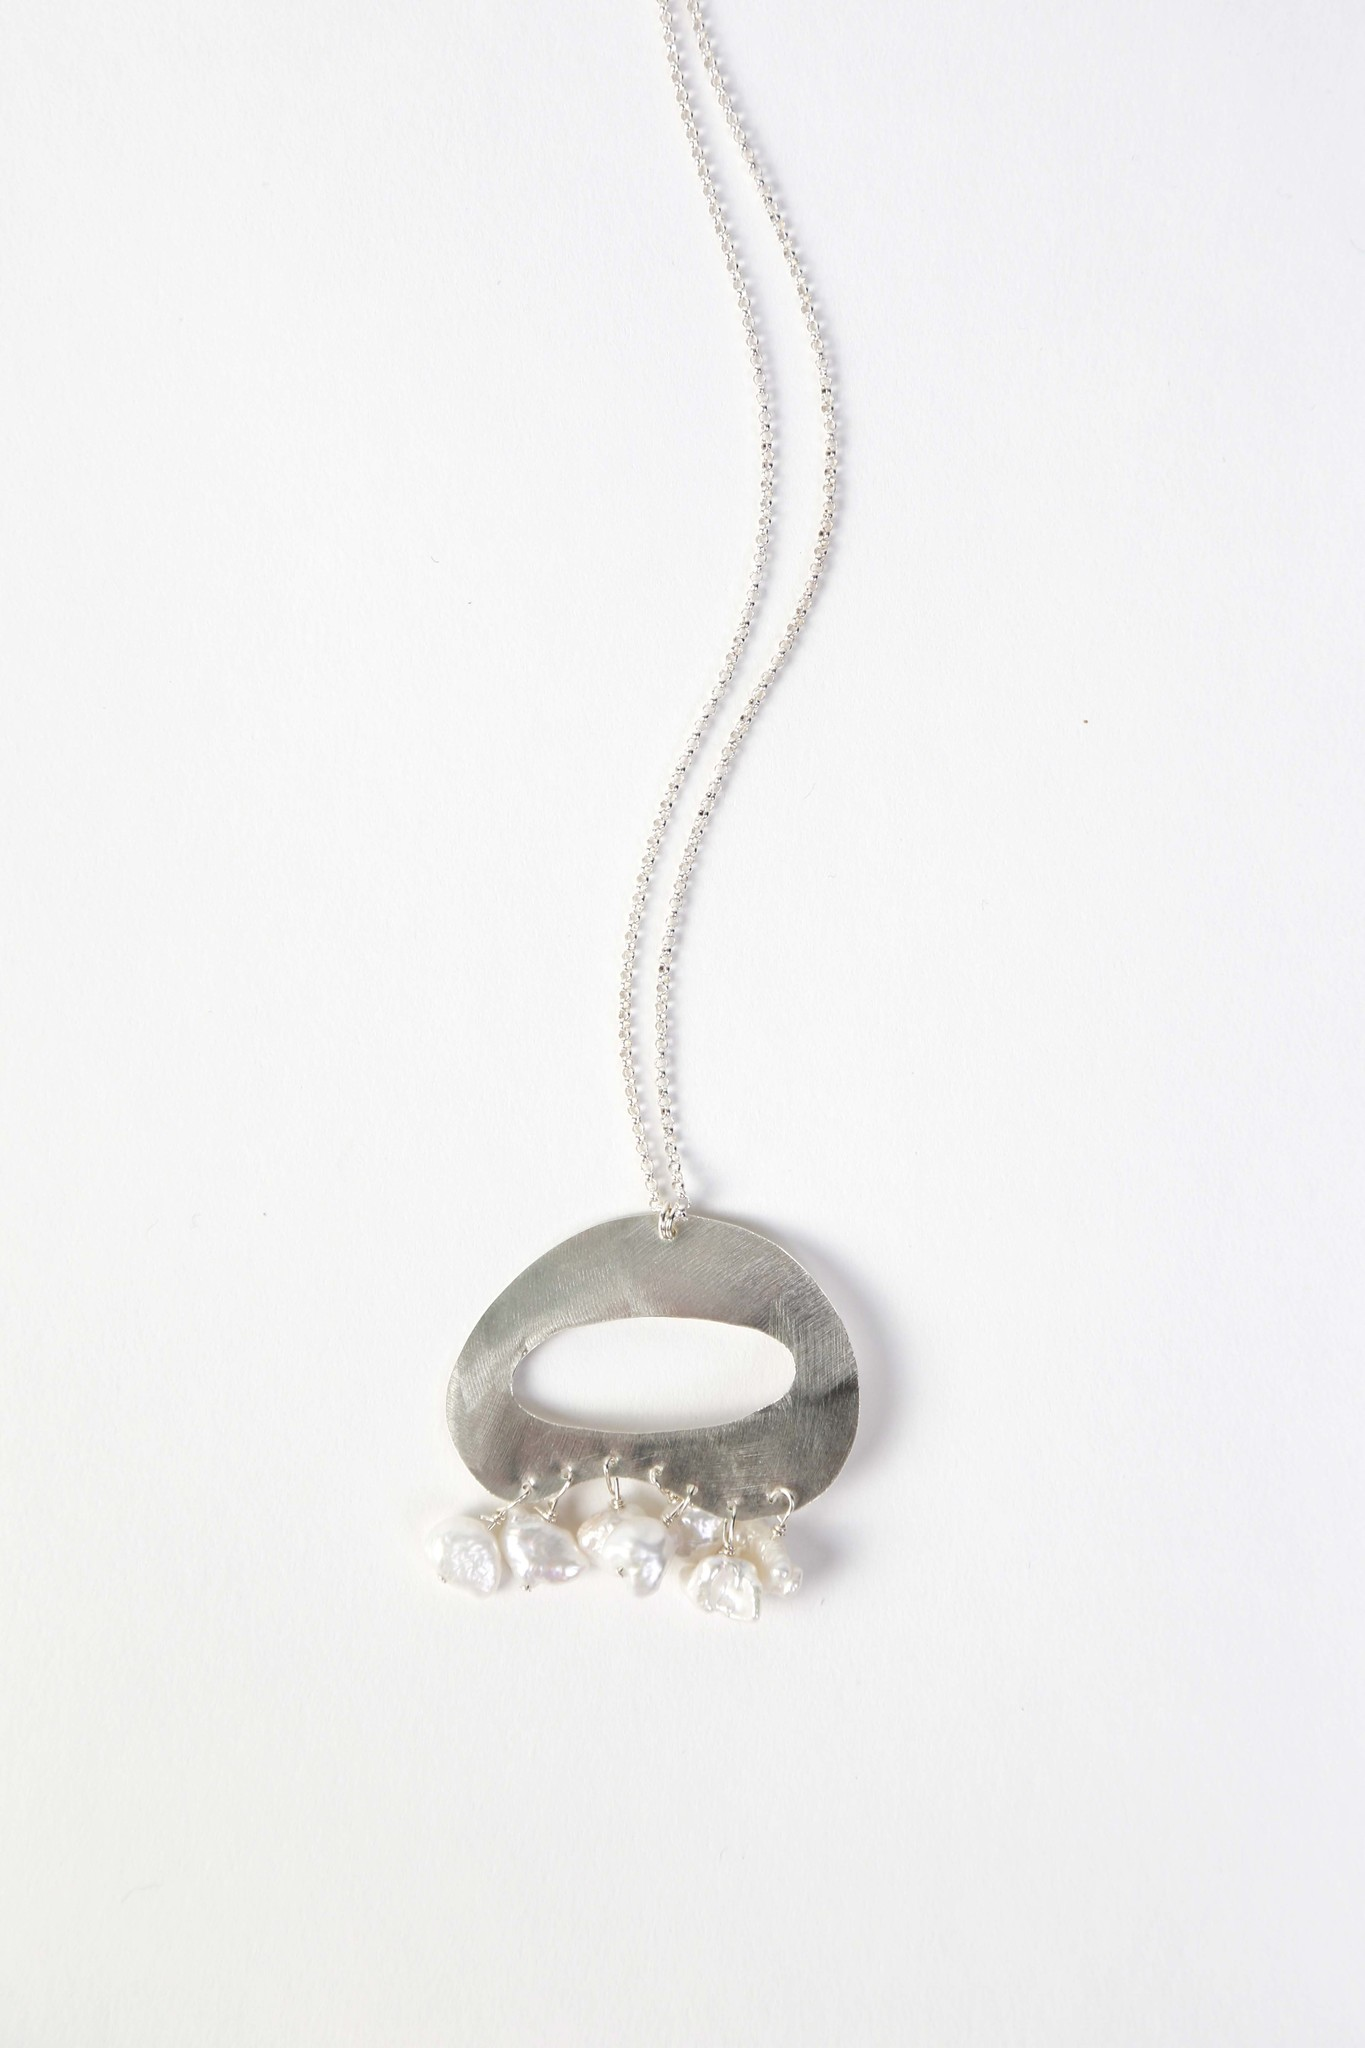 Chertova Tranquility Necklace, Sterling Silver